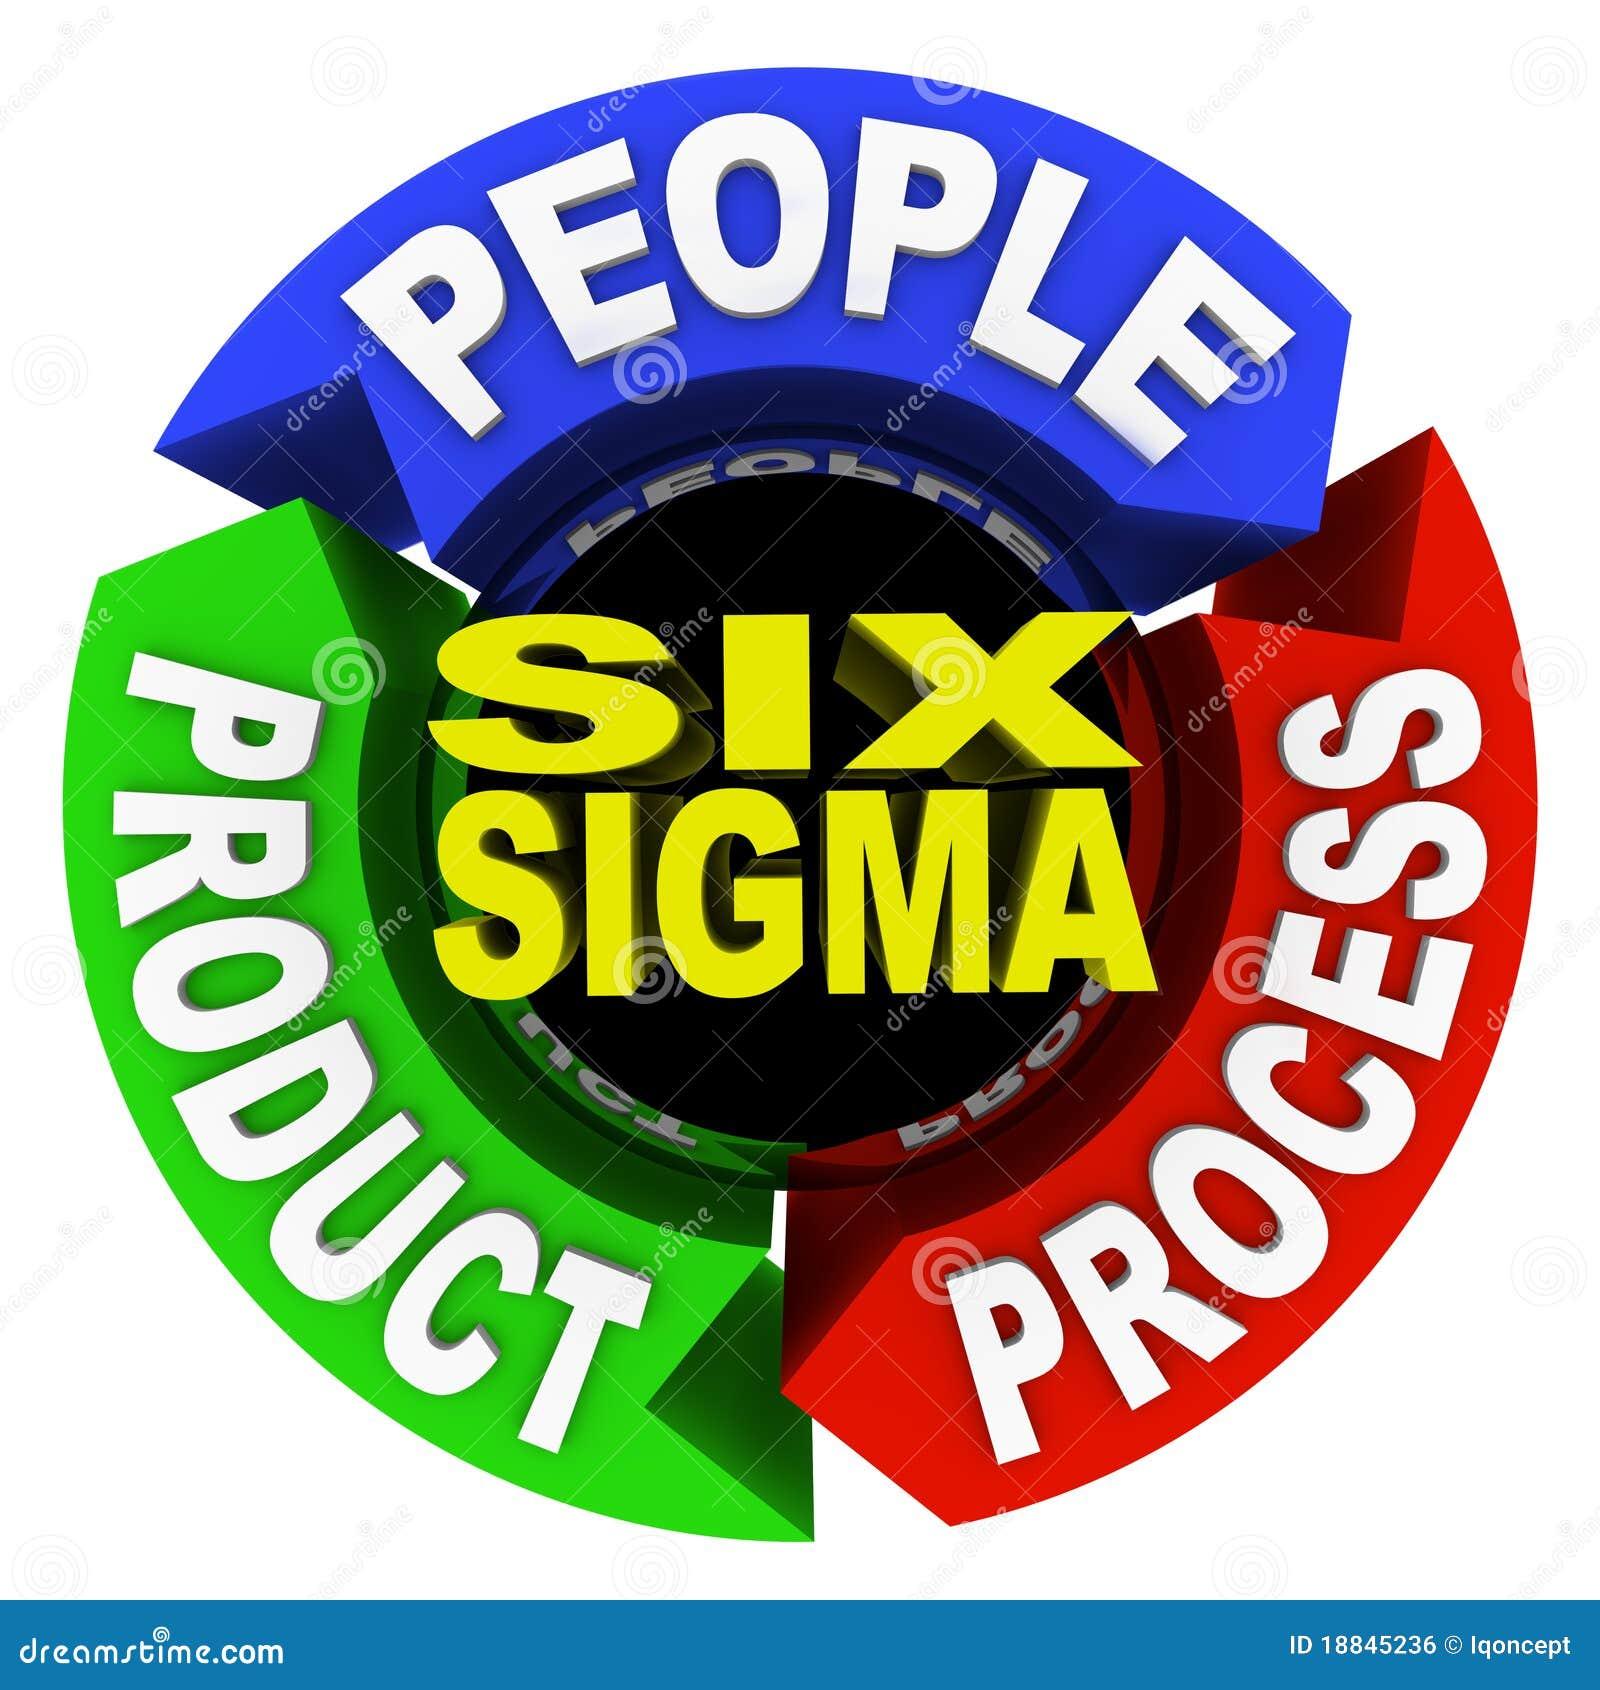 Six sigma principles circle diagram stock illustration royalty free stock photo xflitez Image collections